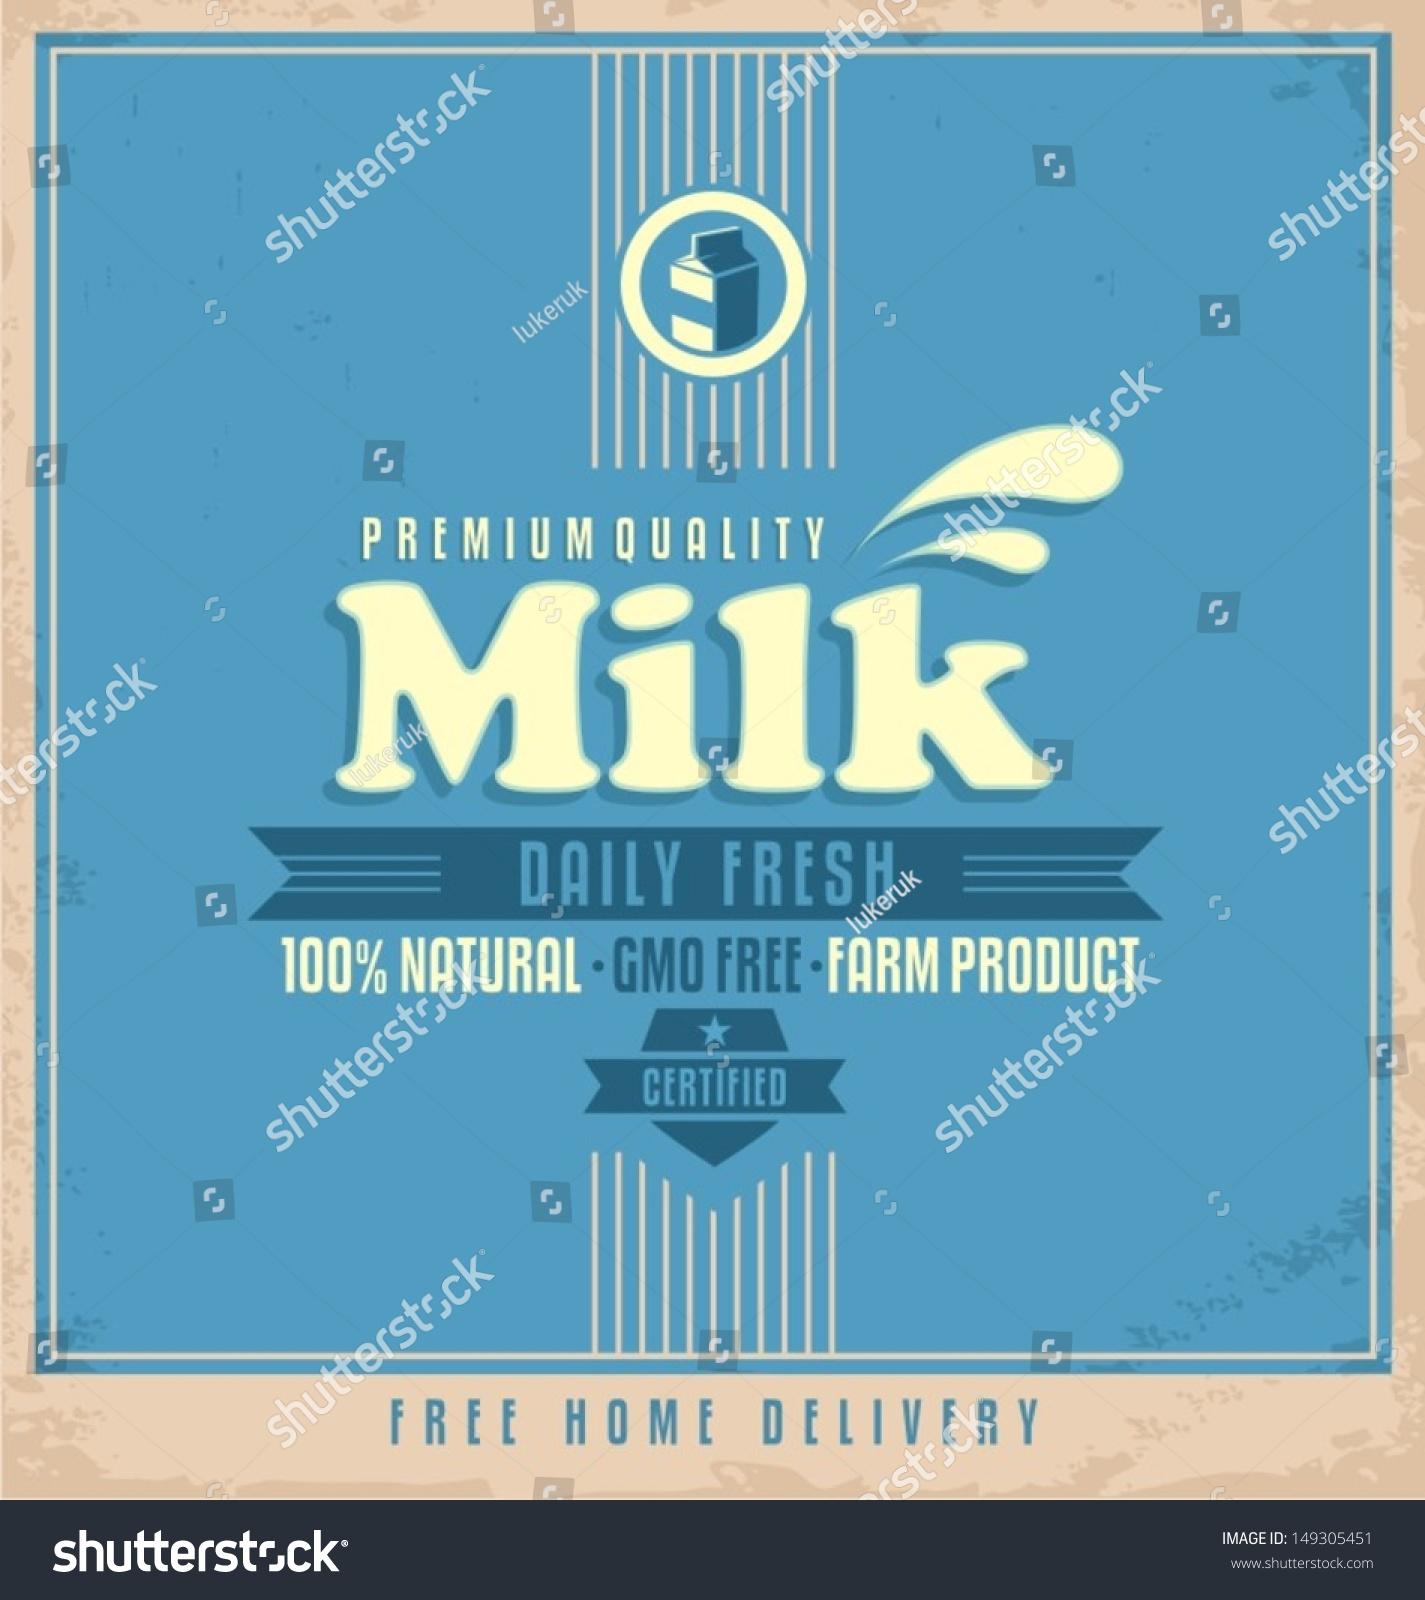 Design poster retro - Milk Retro Poster Design Food And Drink Label Concept